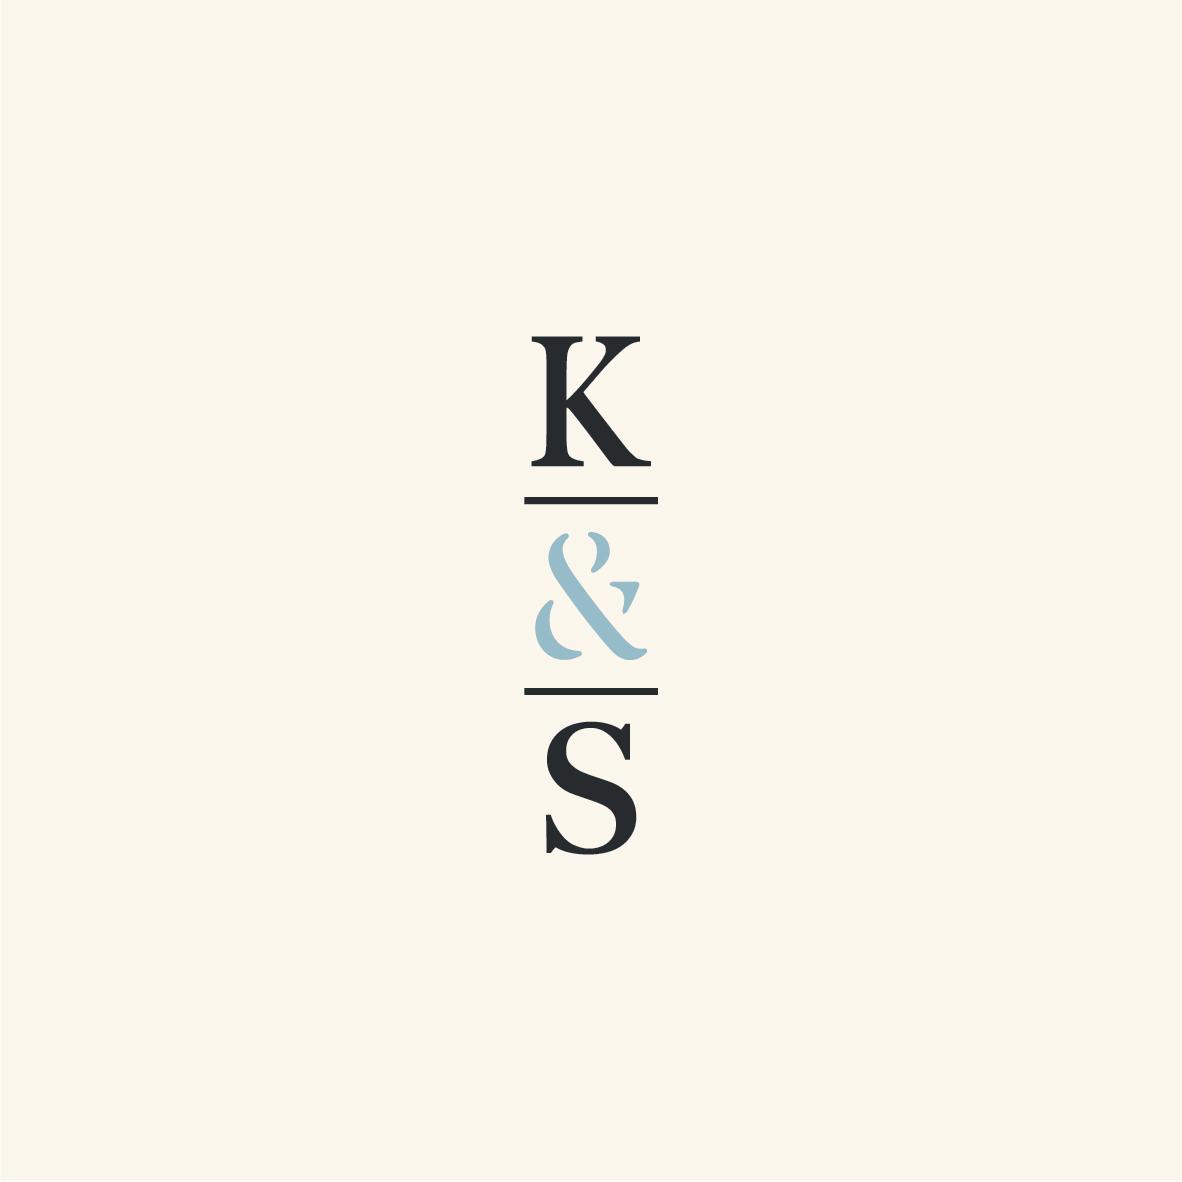 KS_monogram-03.jpg